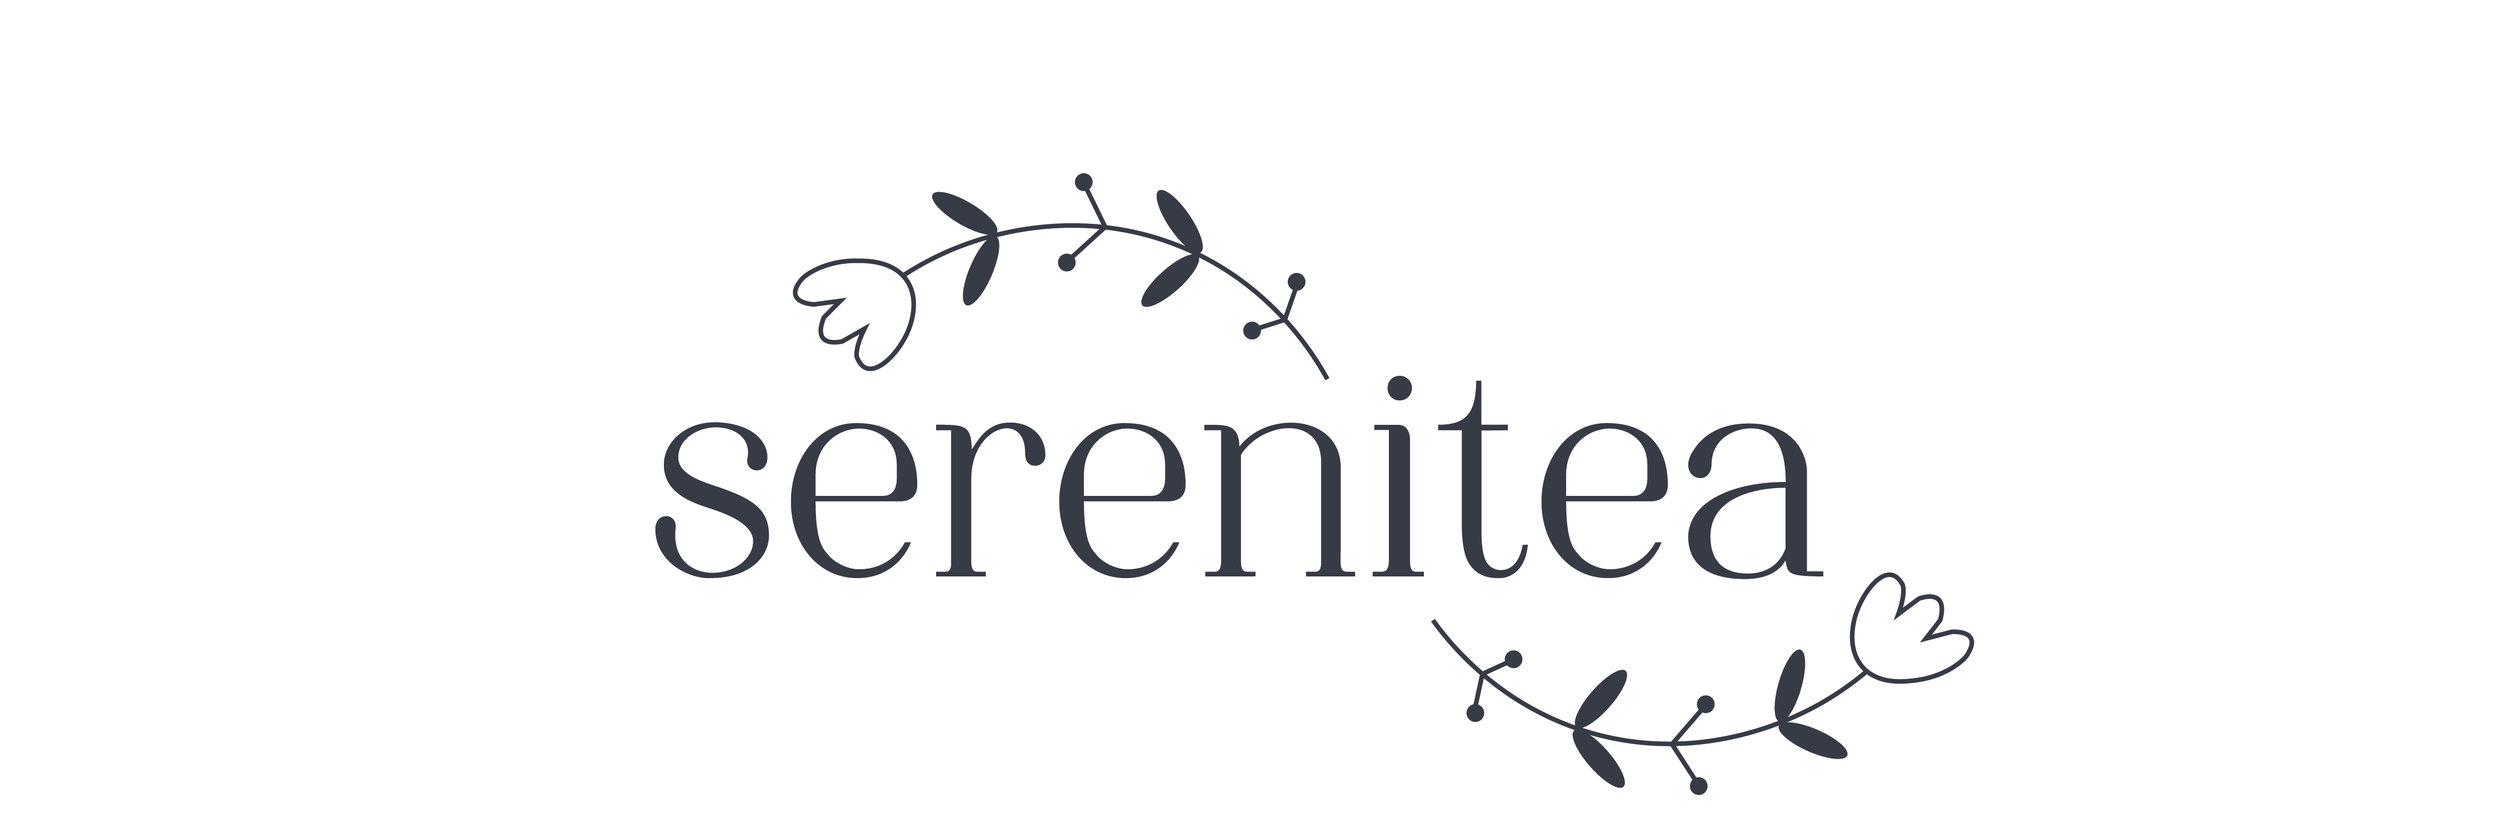 serenitea-logo-exploration2.jpg